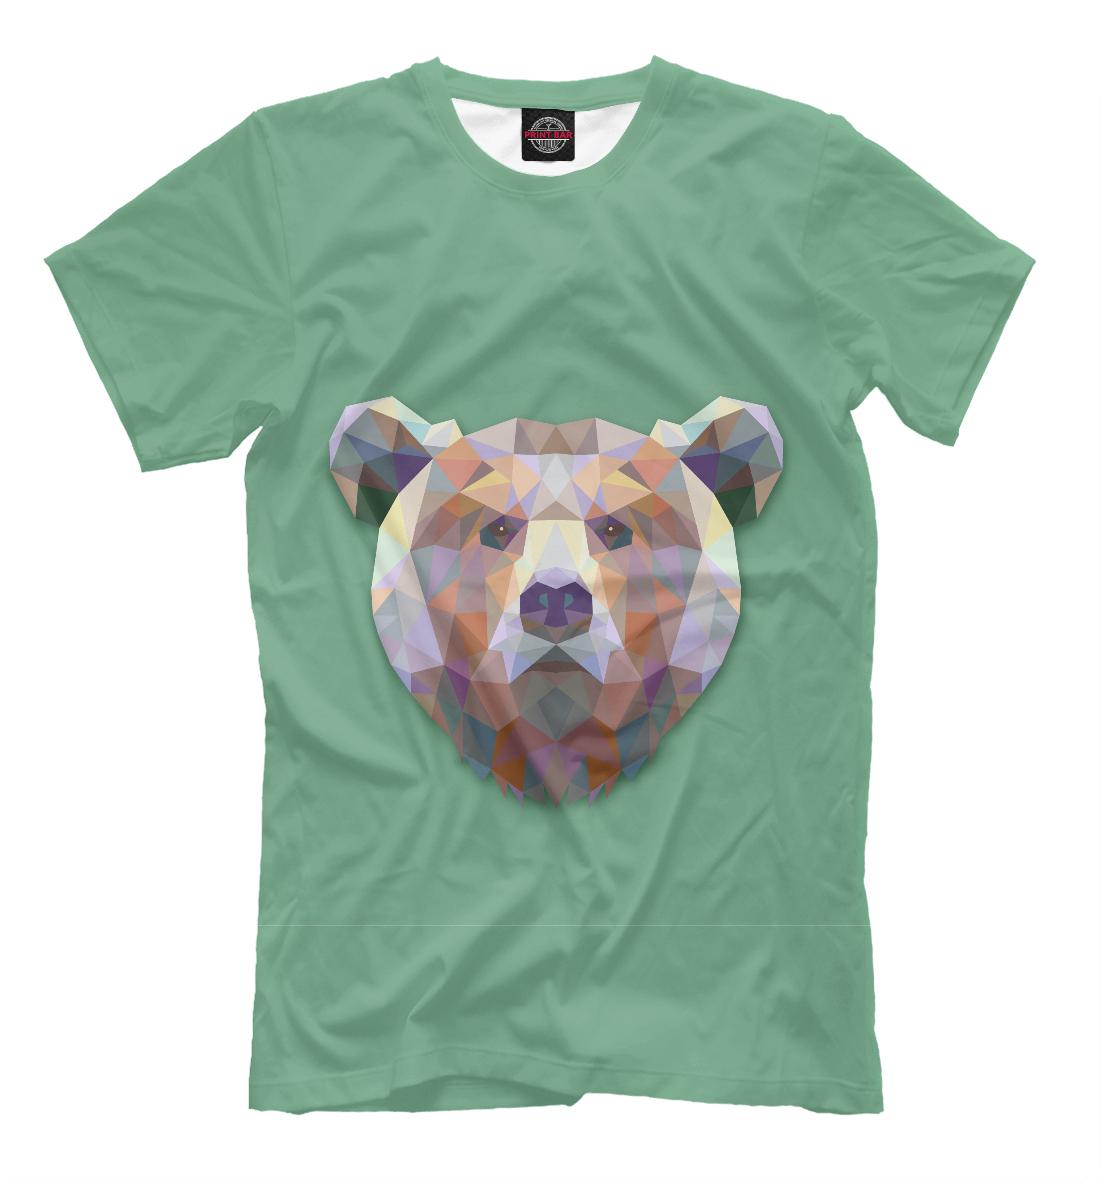 Купить Grizzly, Printbar, Футболки, MED-348313-fut-2